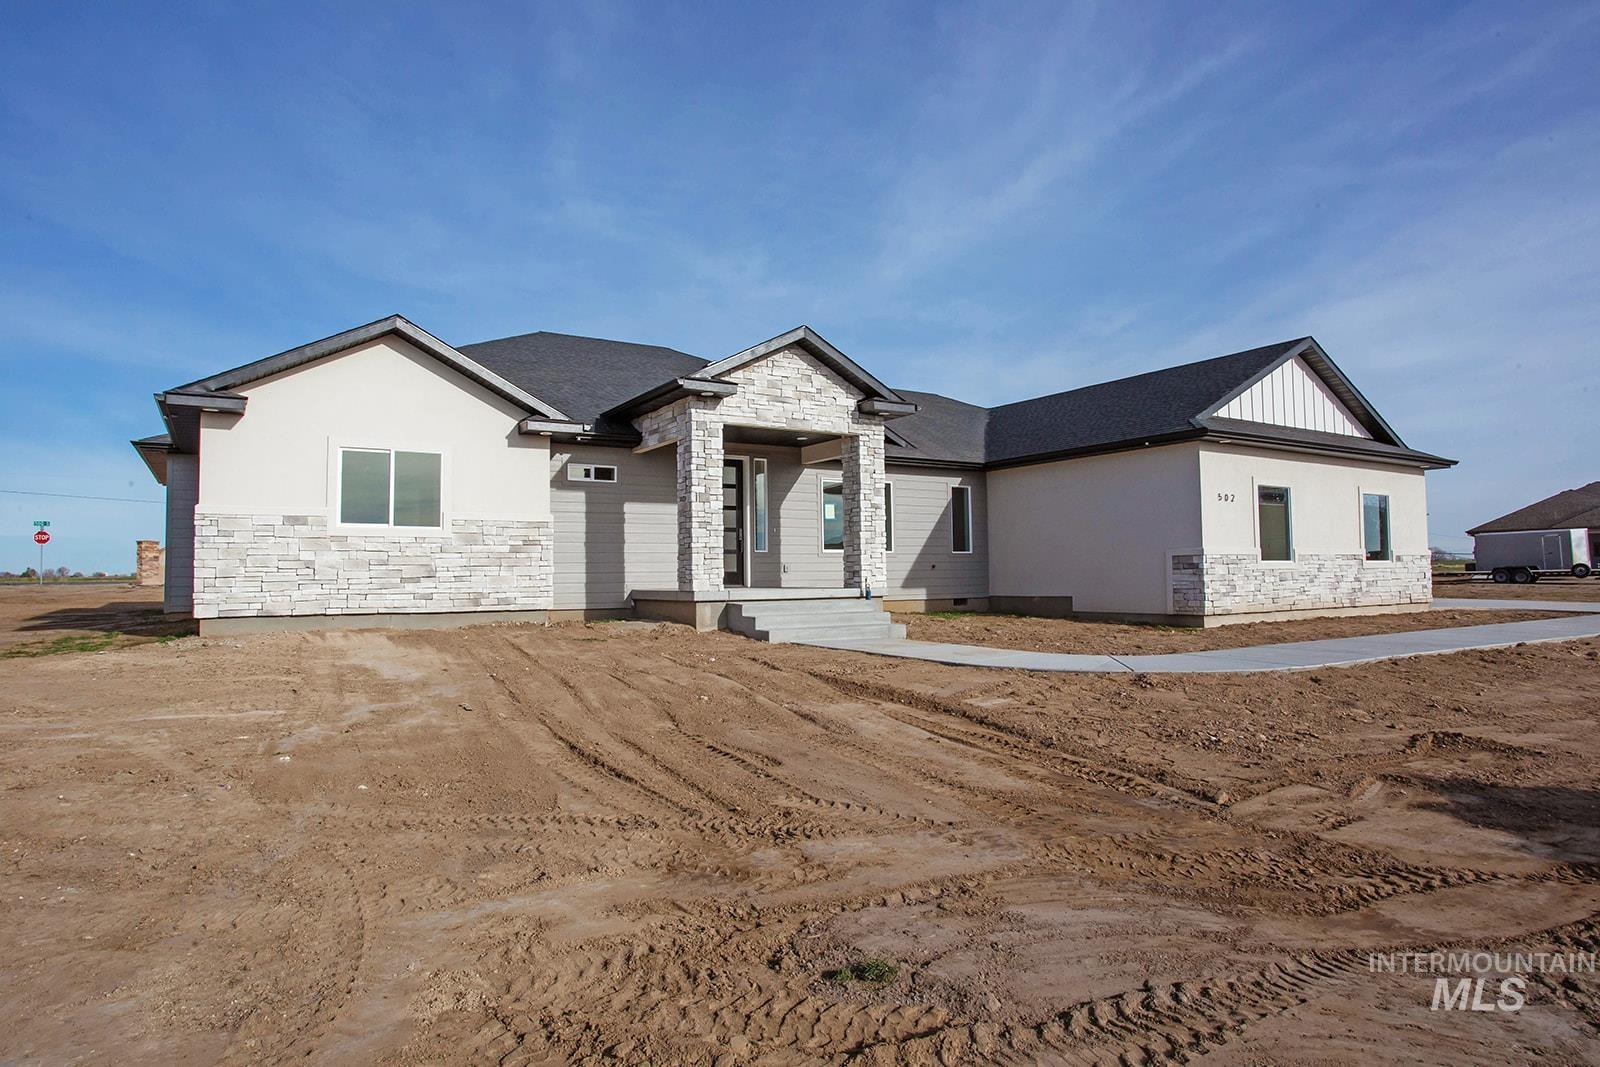 502 Tasia Brianna Dr. East Property Photo